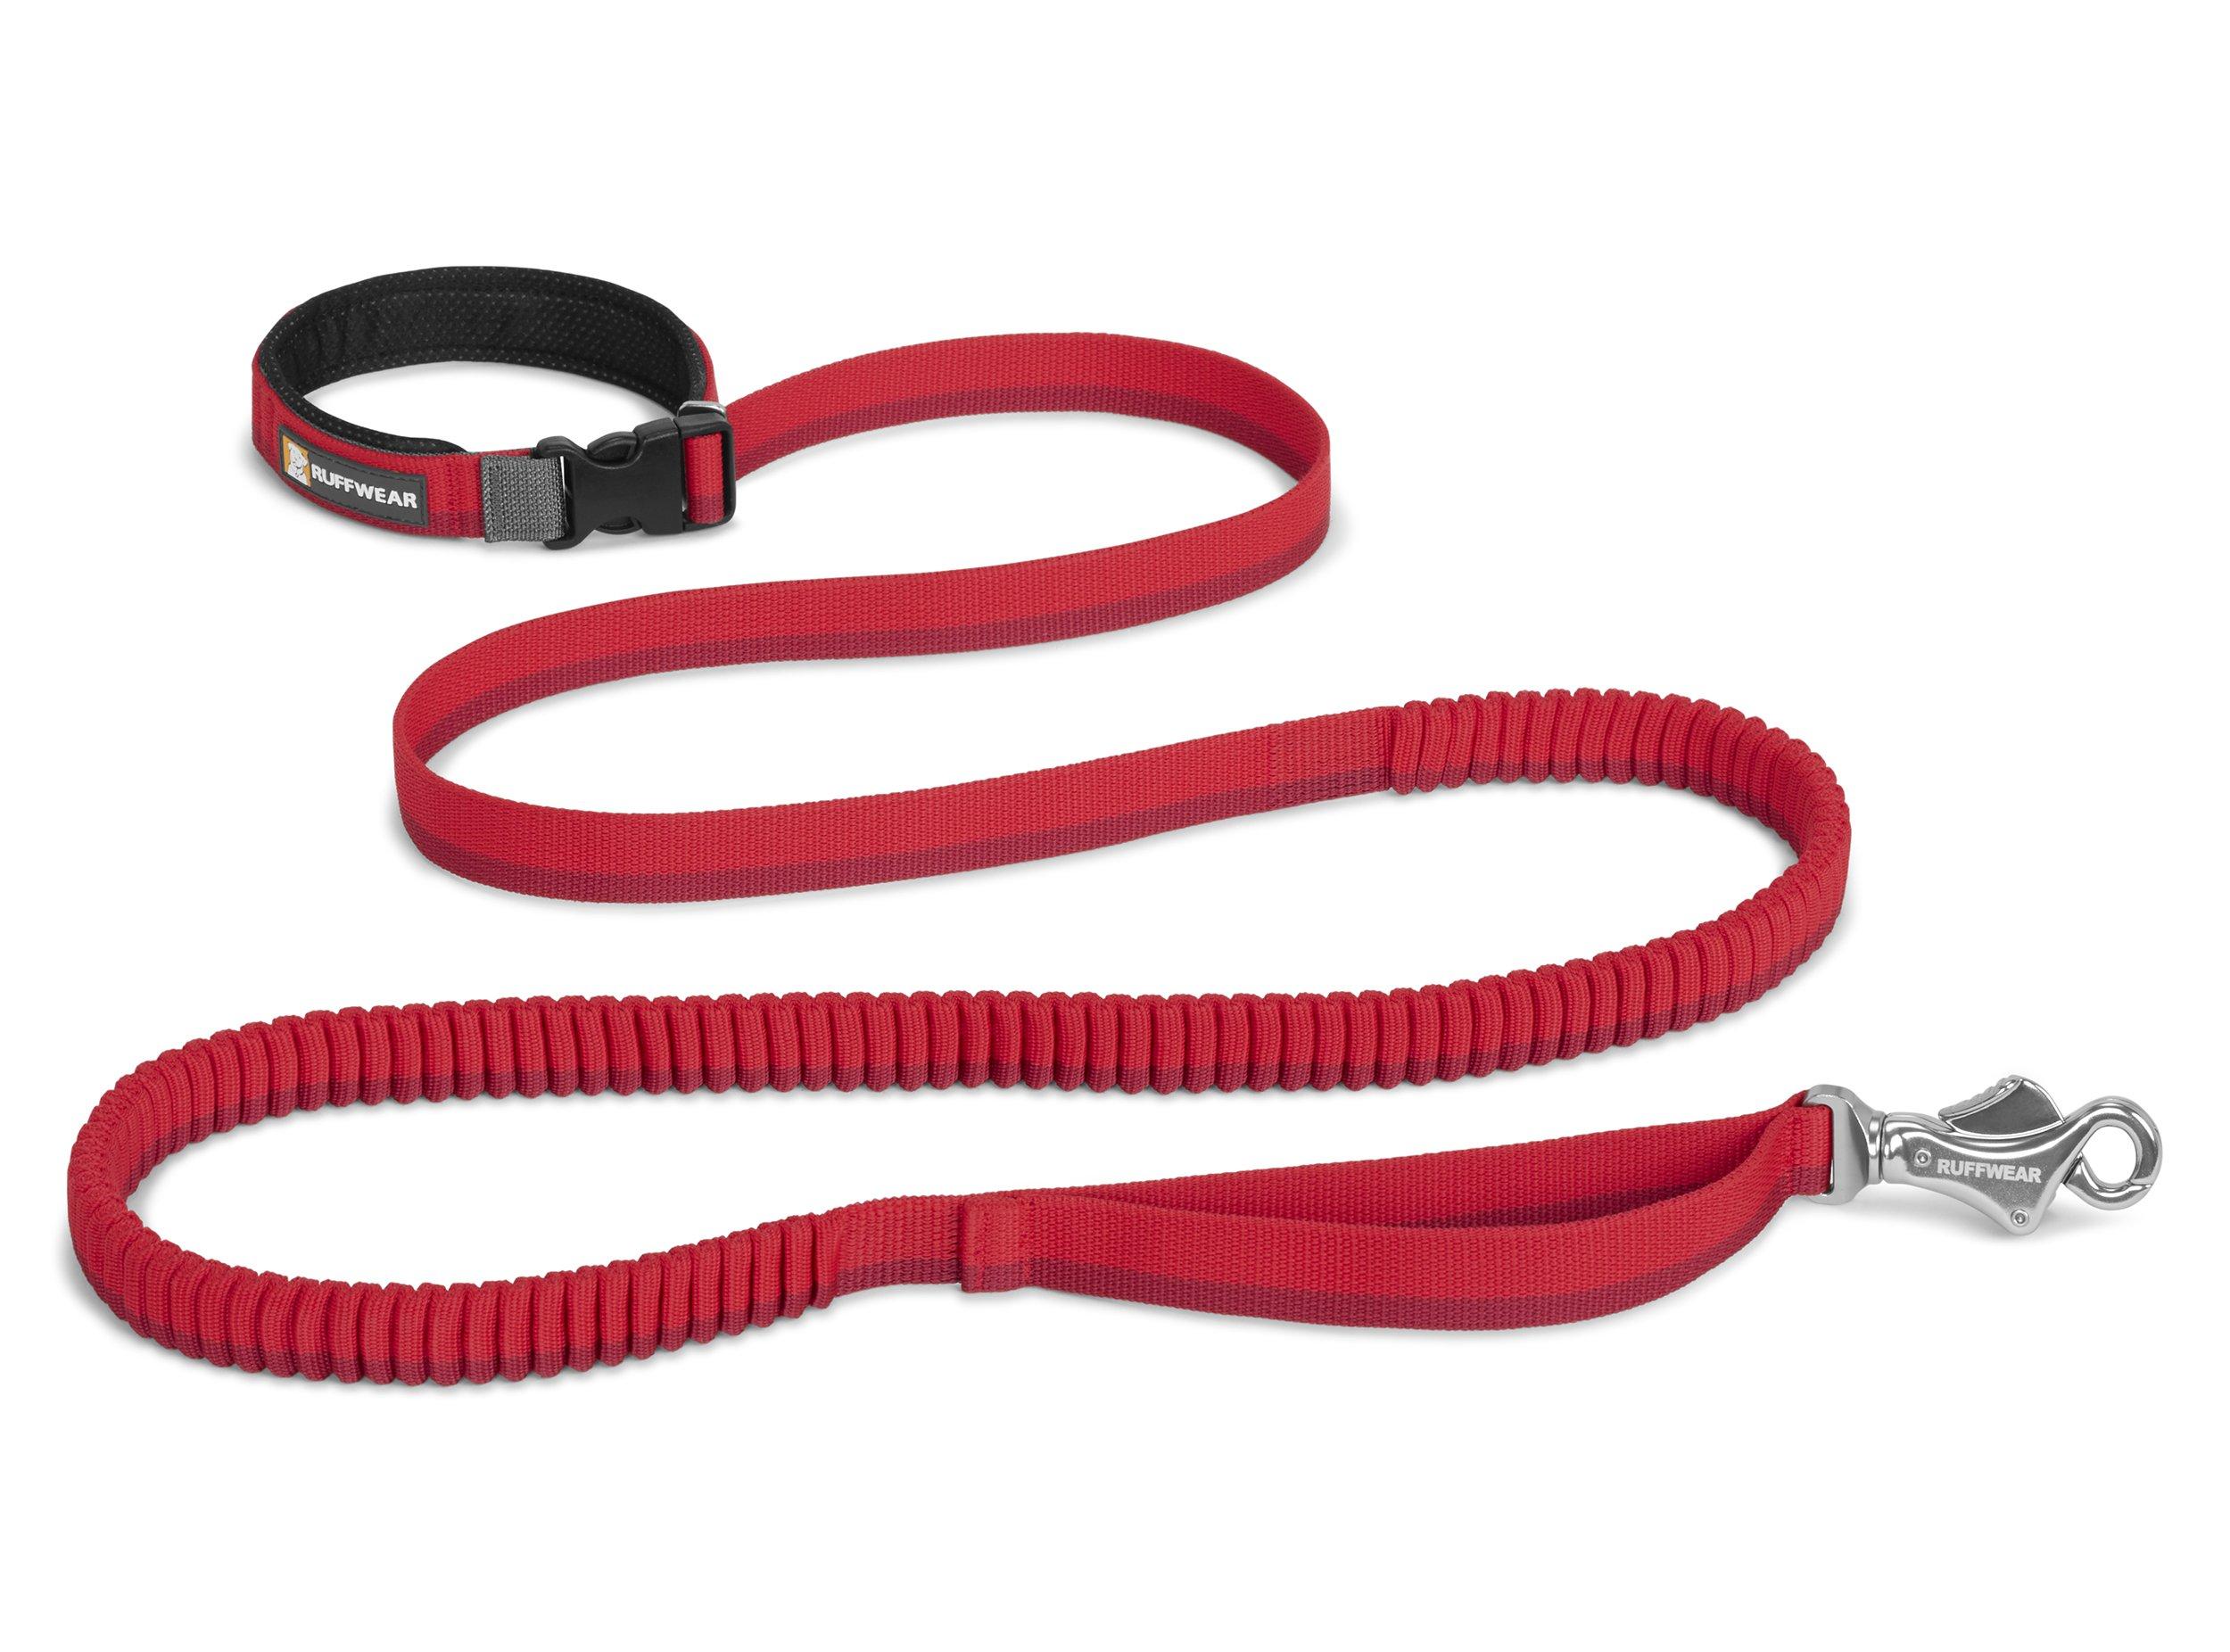 RUFFWEAR - Roamer Extending Dog Leash, Red Currant (2017), 7.3-11 ft